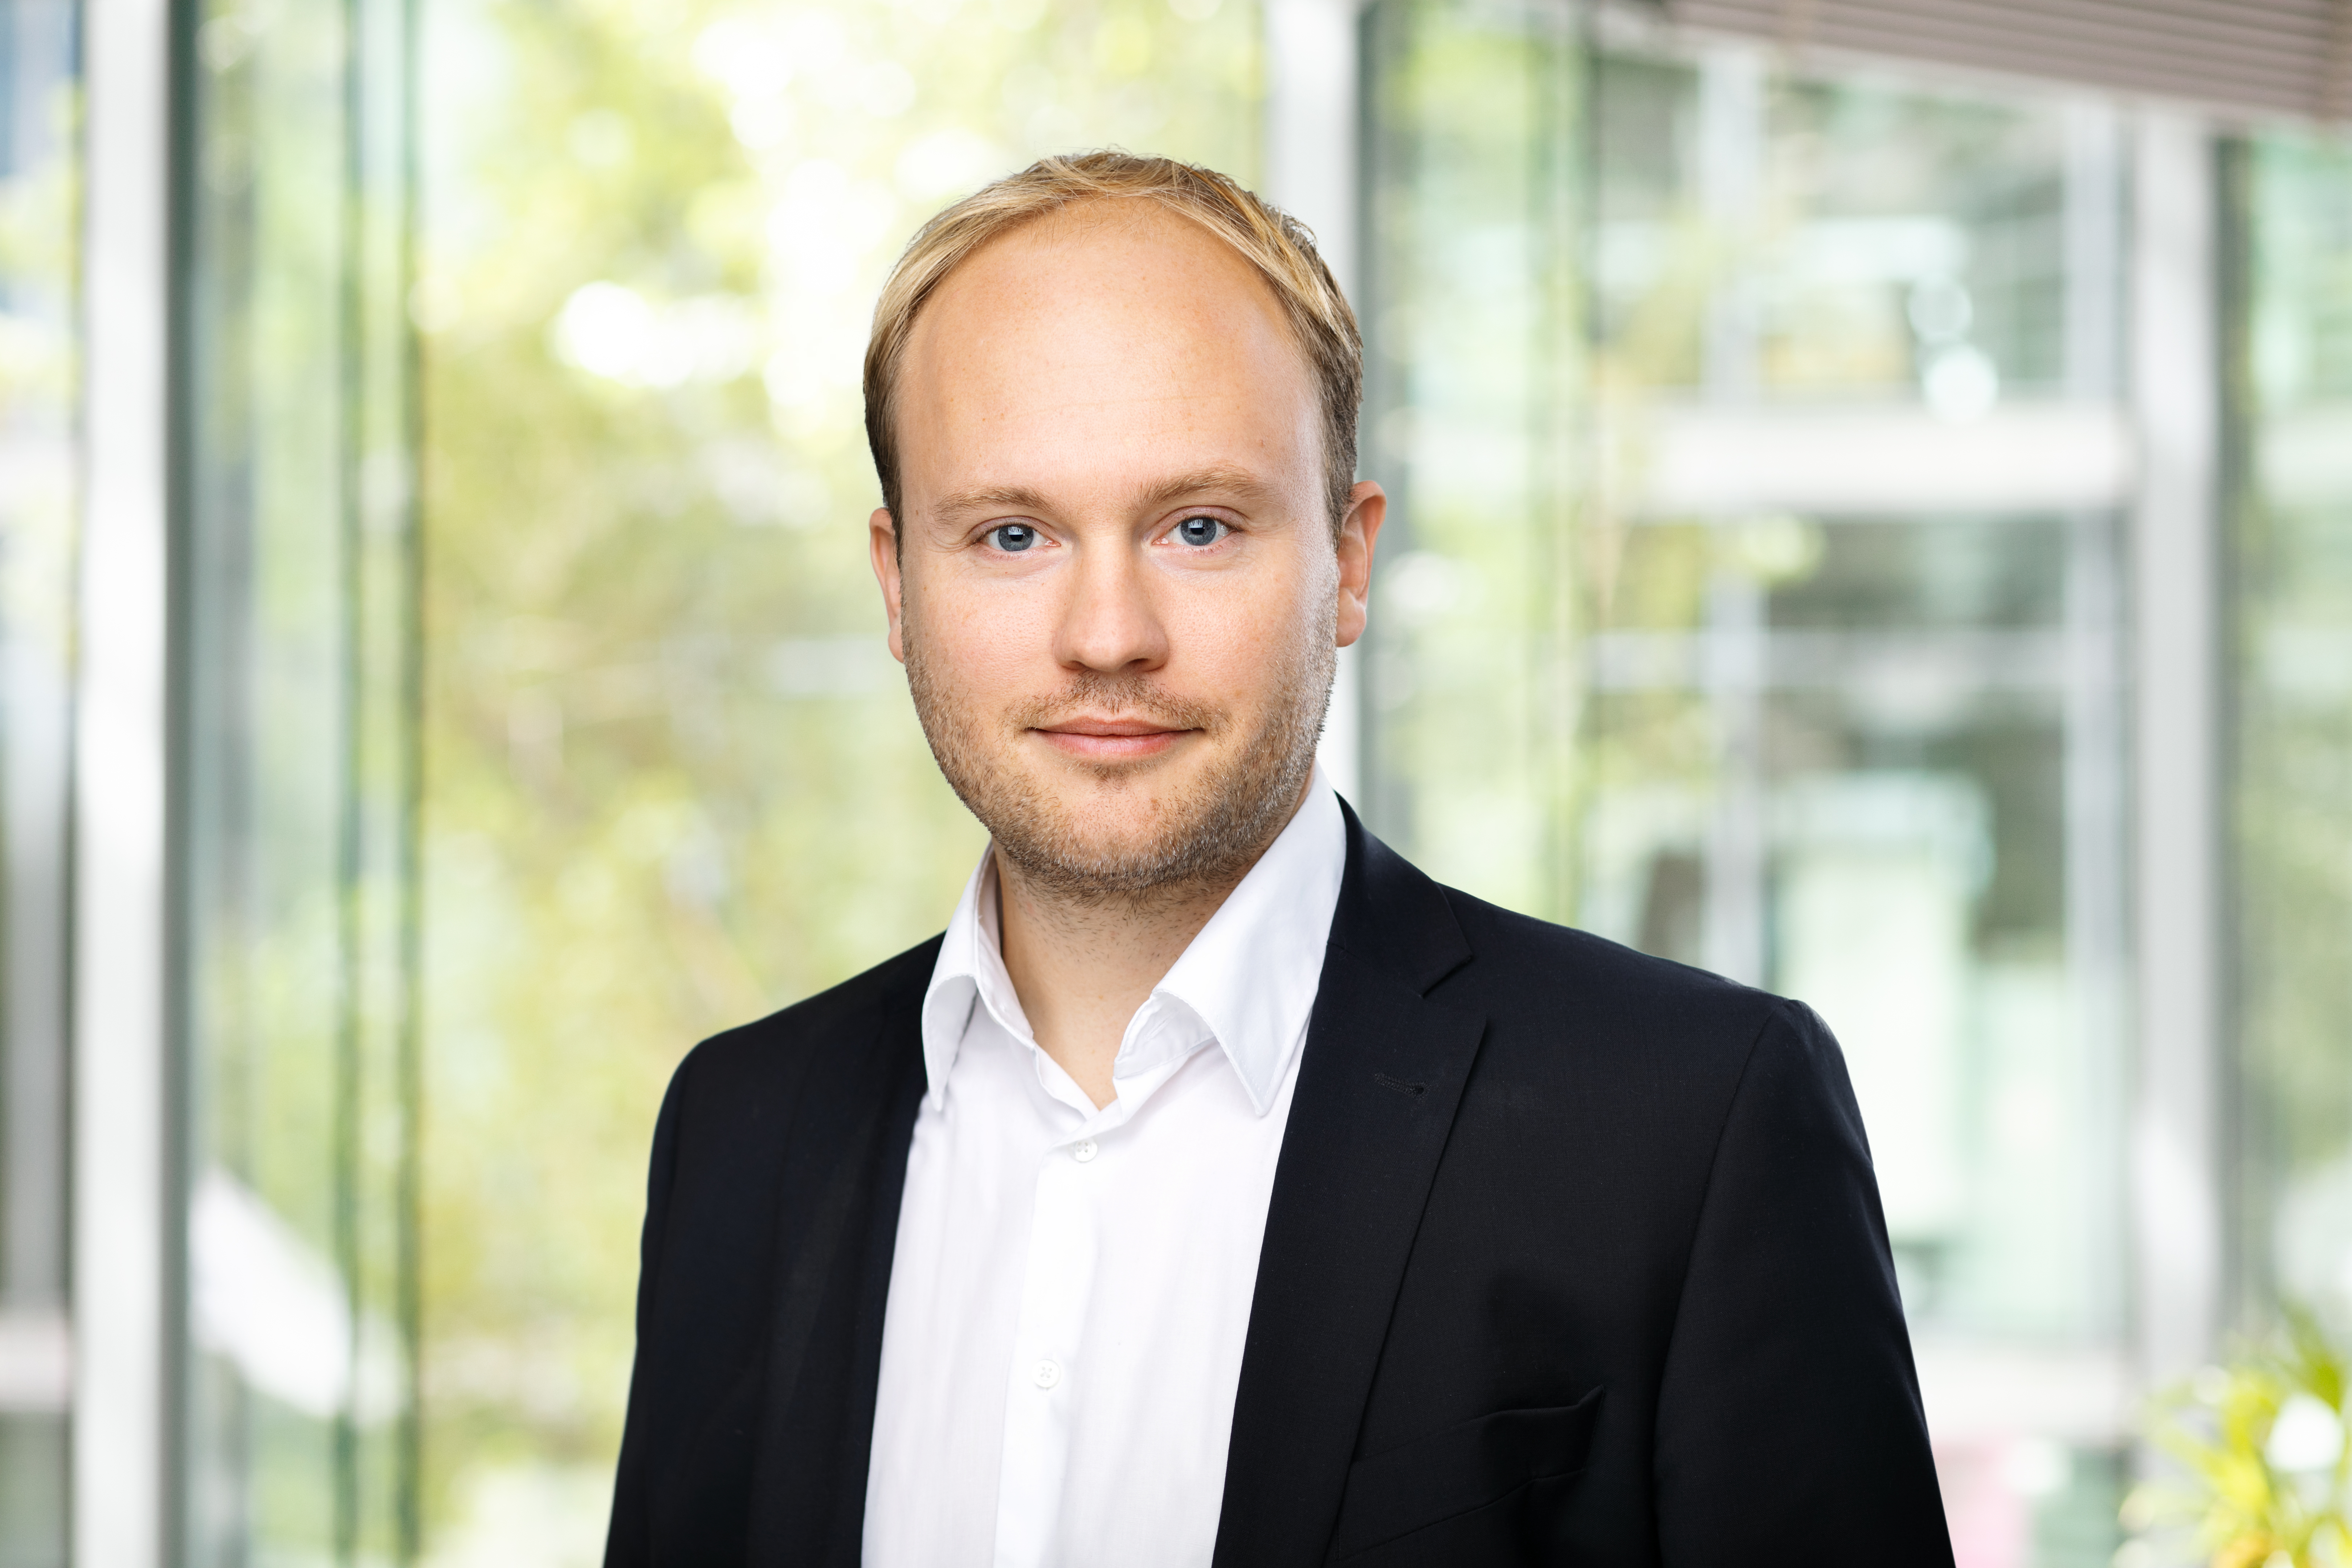 Oliver Schimek